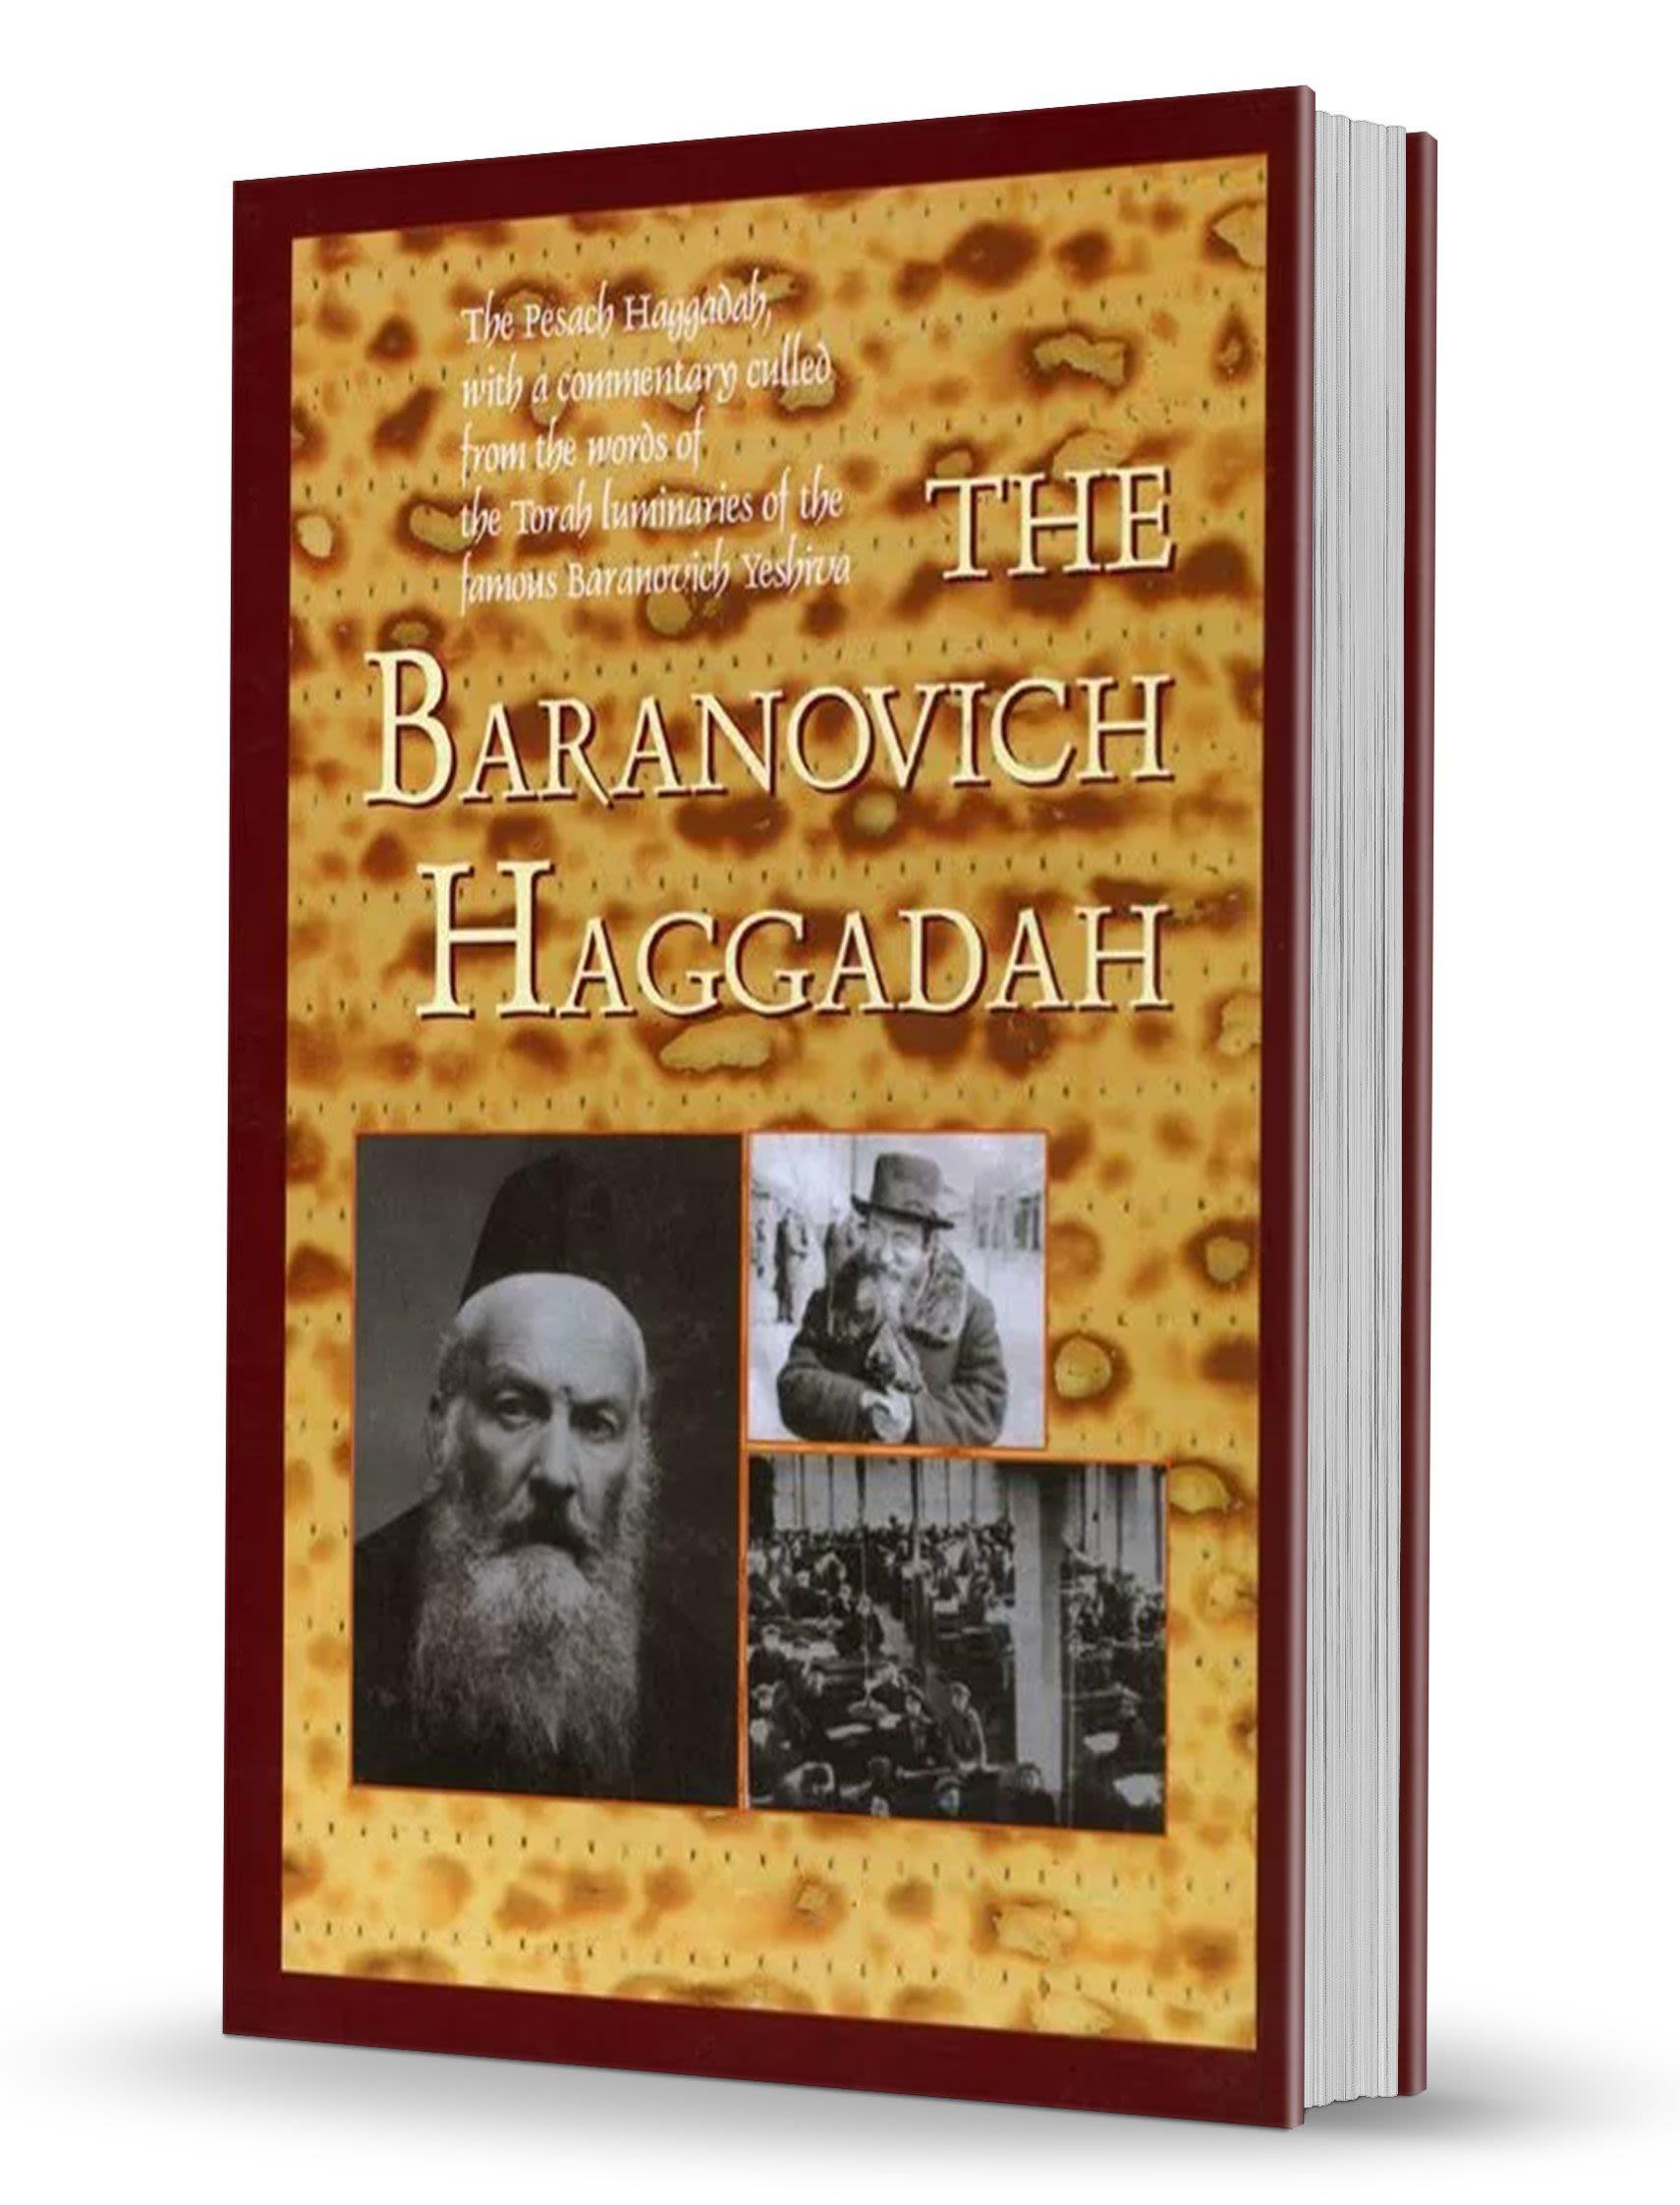 The Baranovich Haggadah